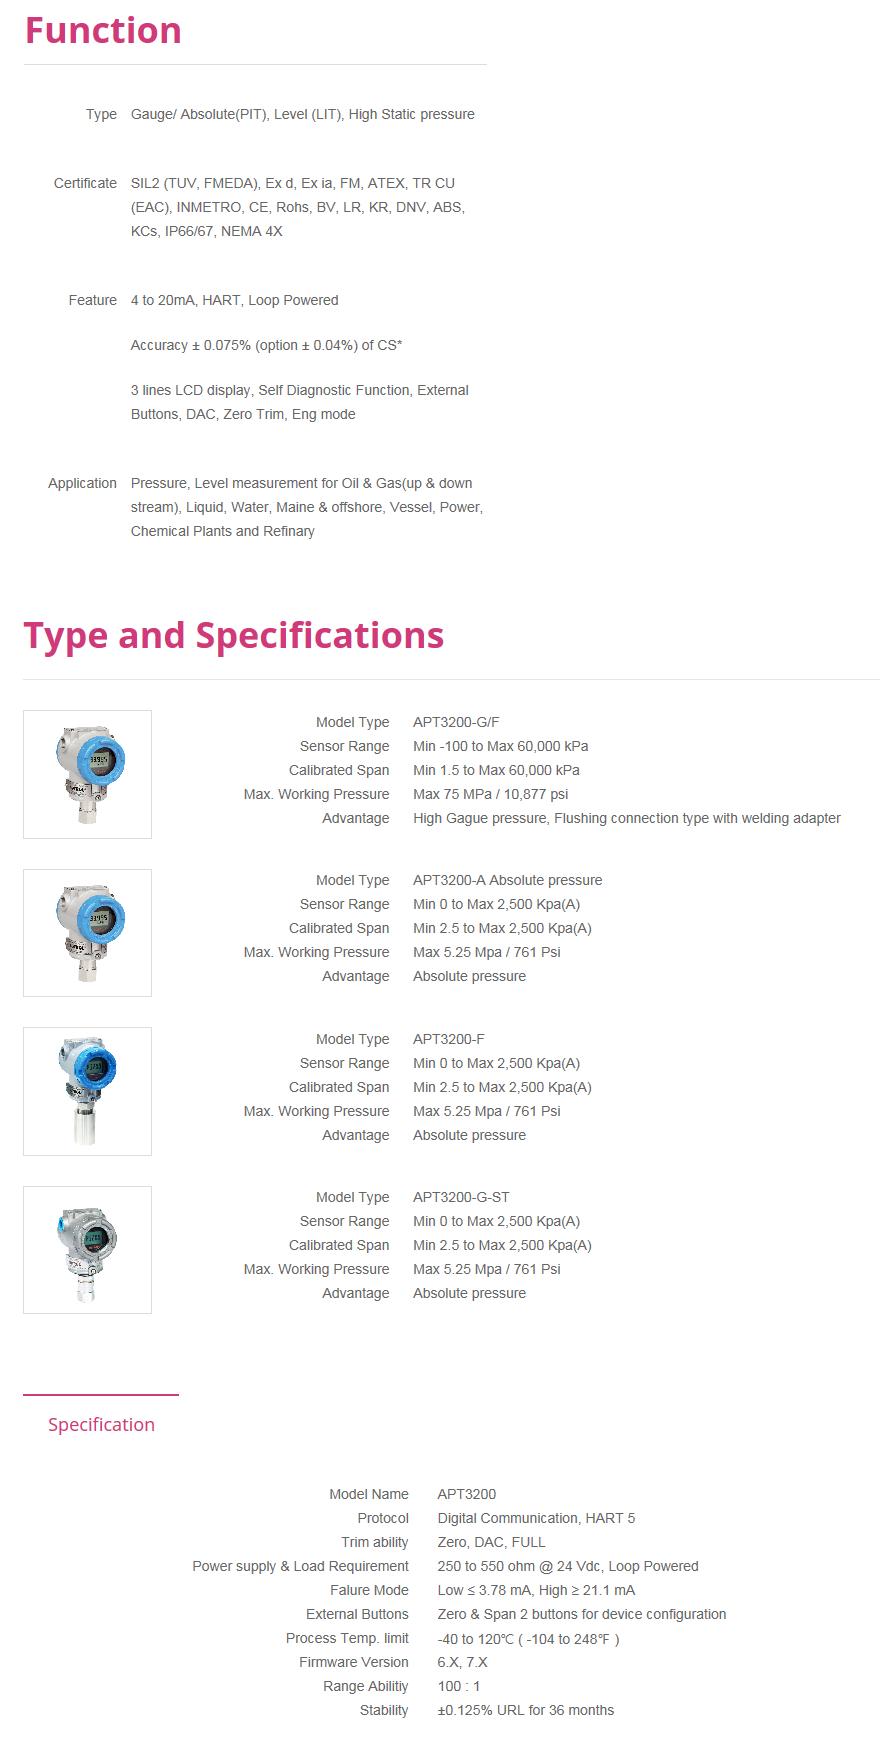 DUON System Smart Pressure Transmitter APT3200